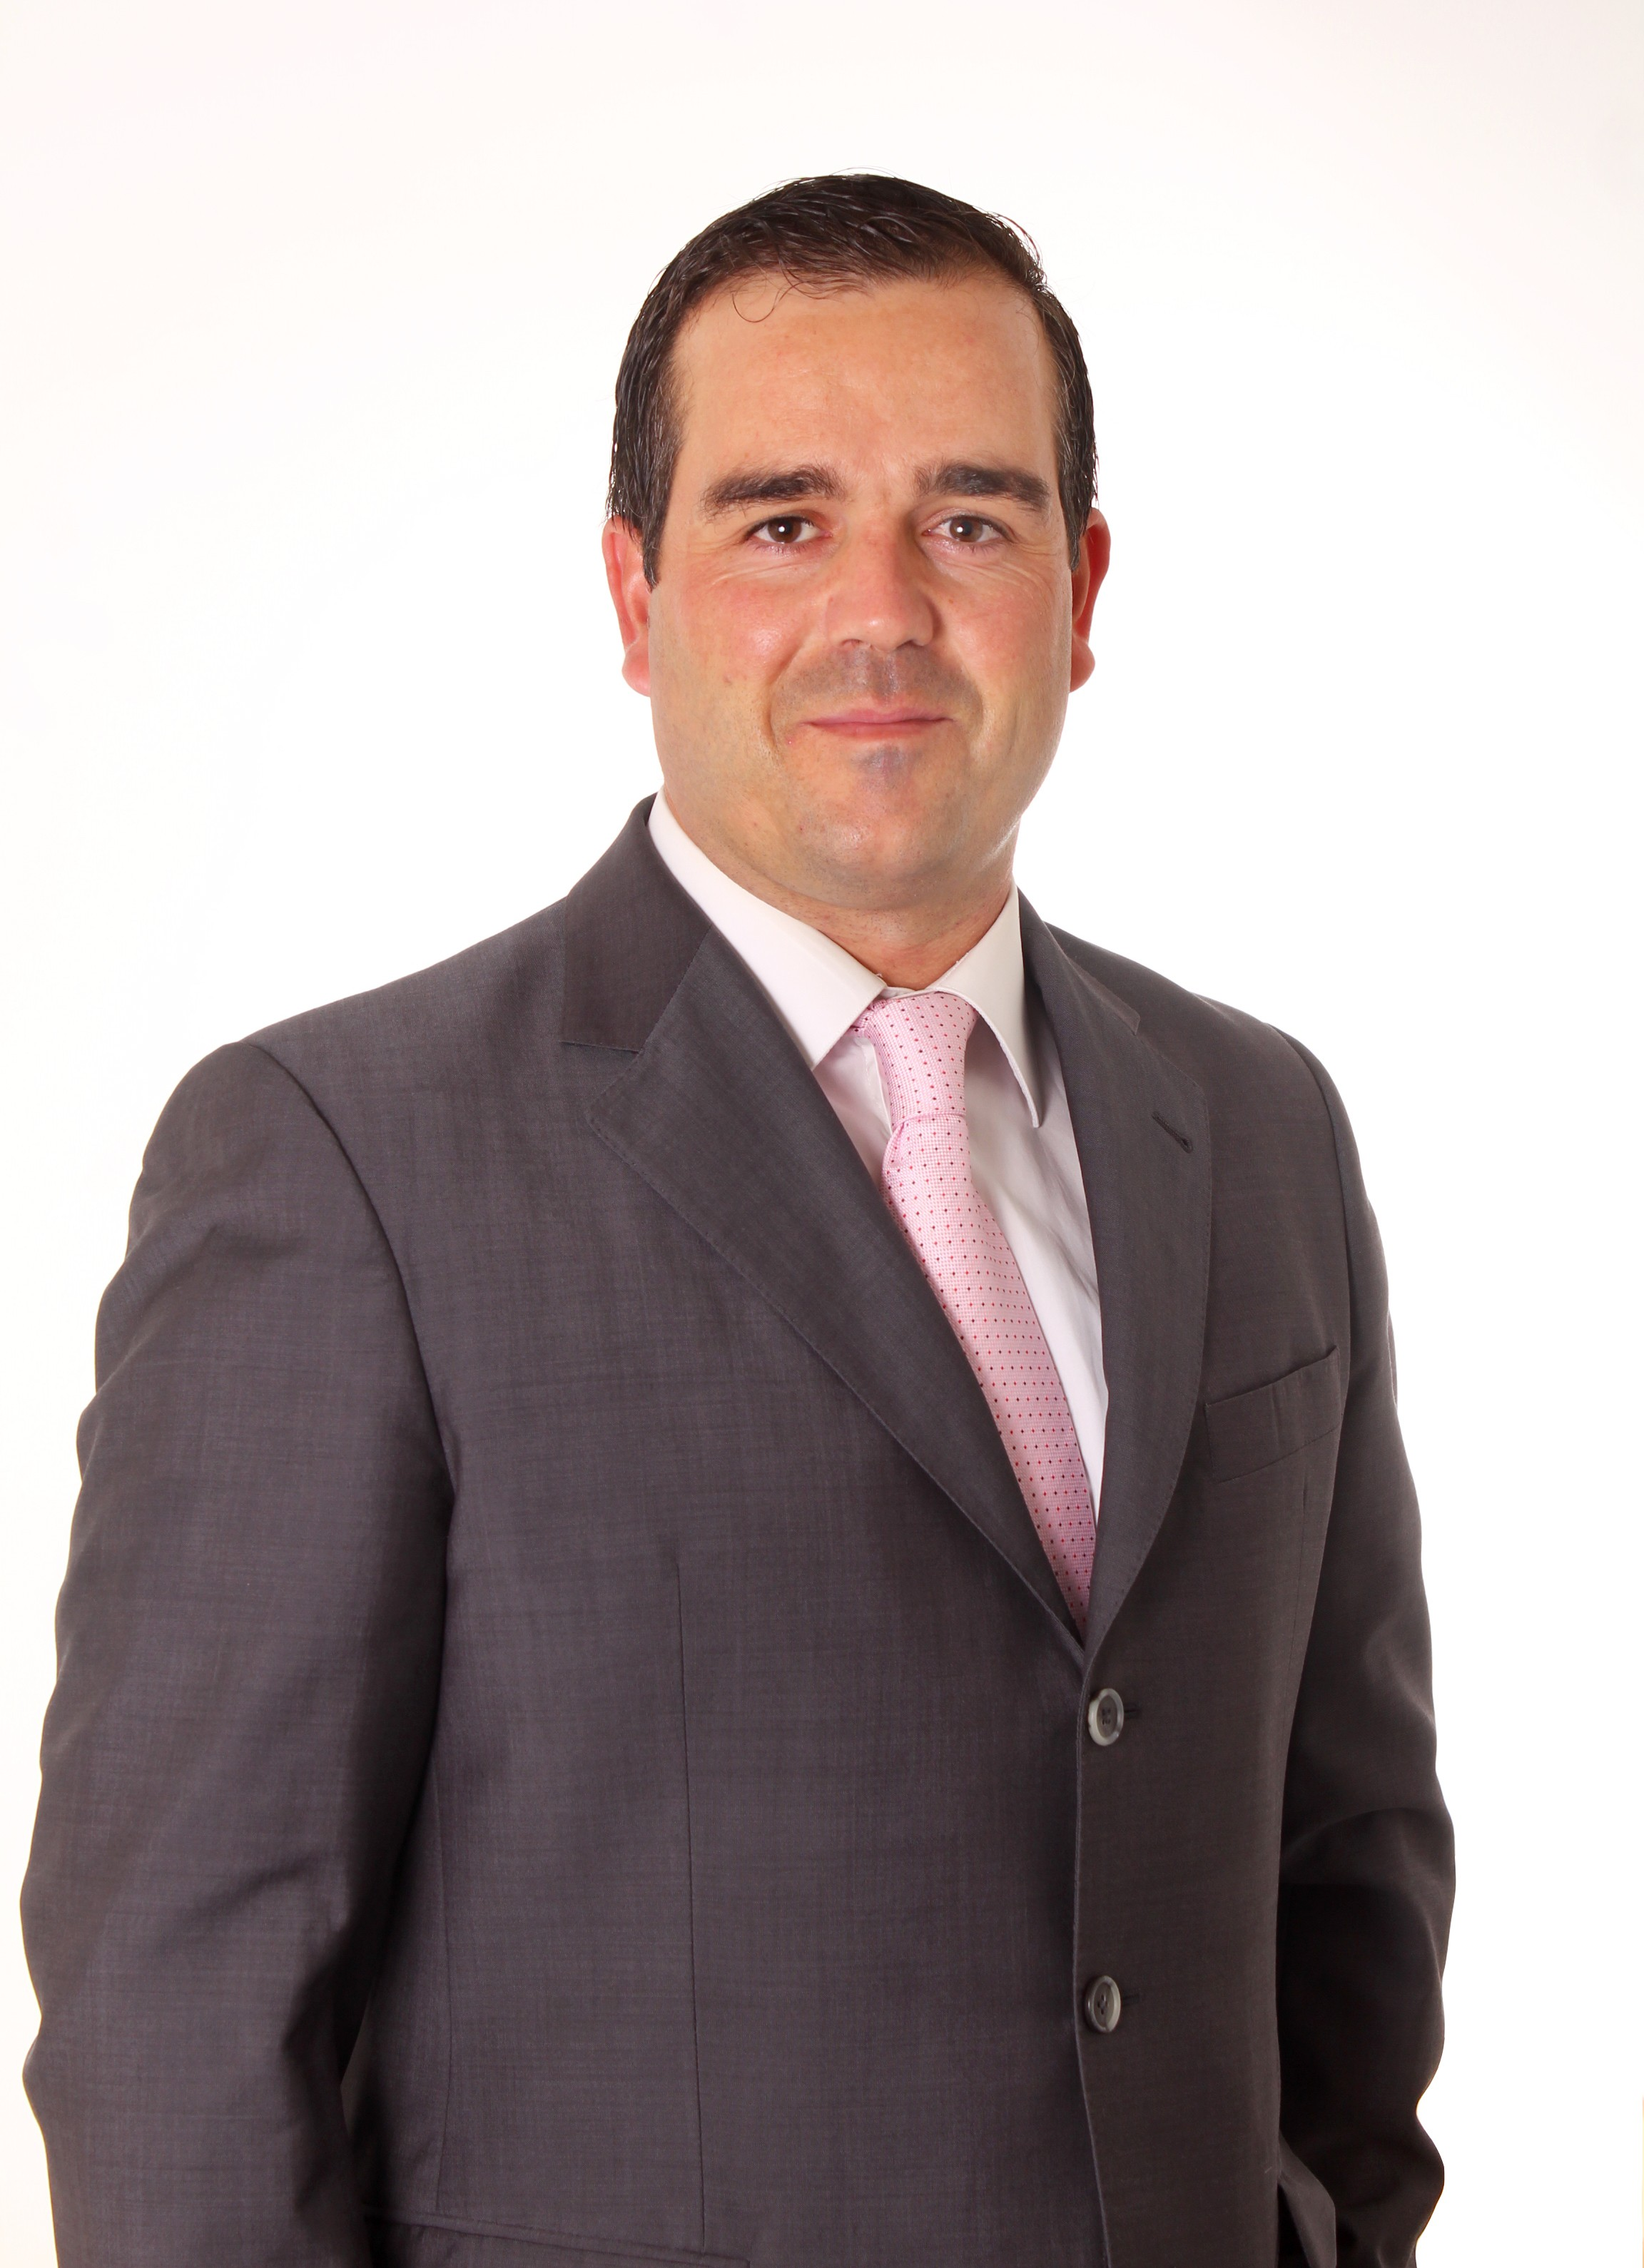 Pablo Calvo Perez